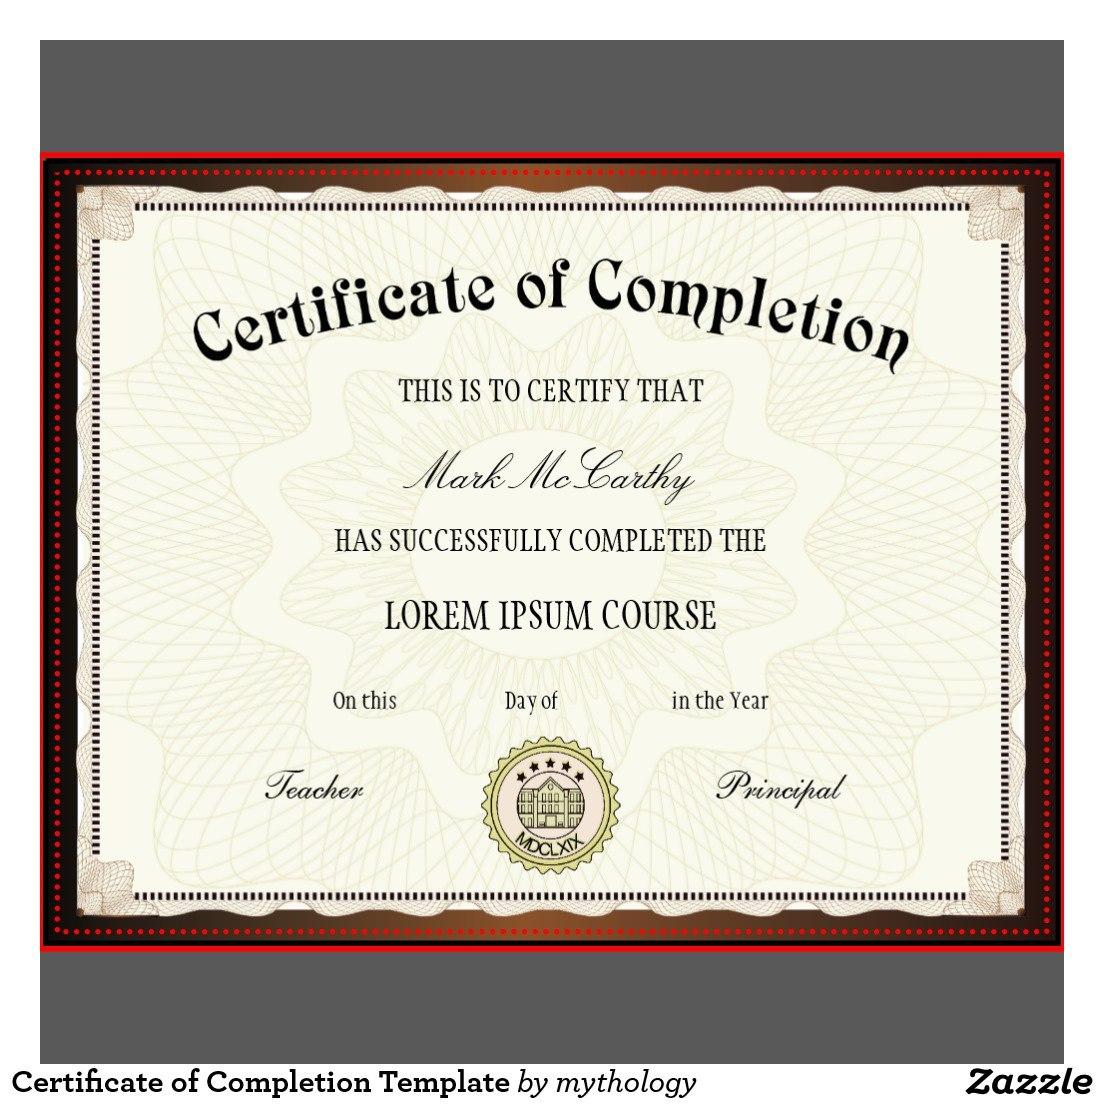 Free Printable Certificates  Certificate Templates For Certificate Of Completion Template Free Printable